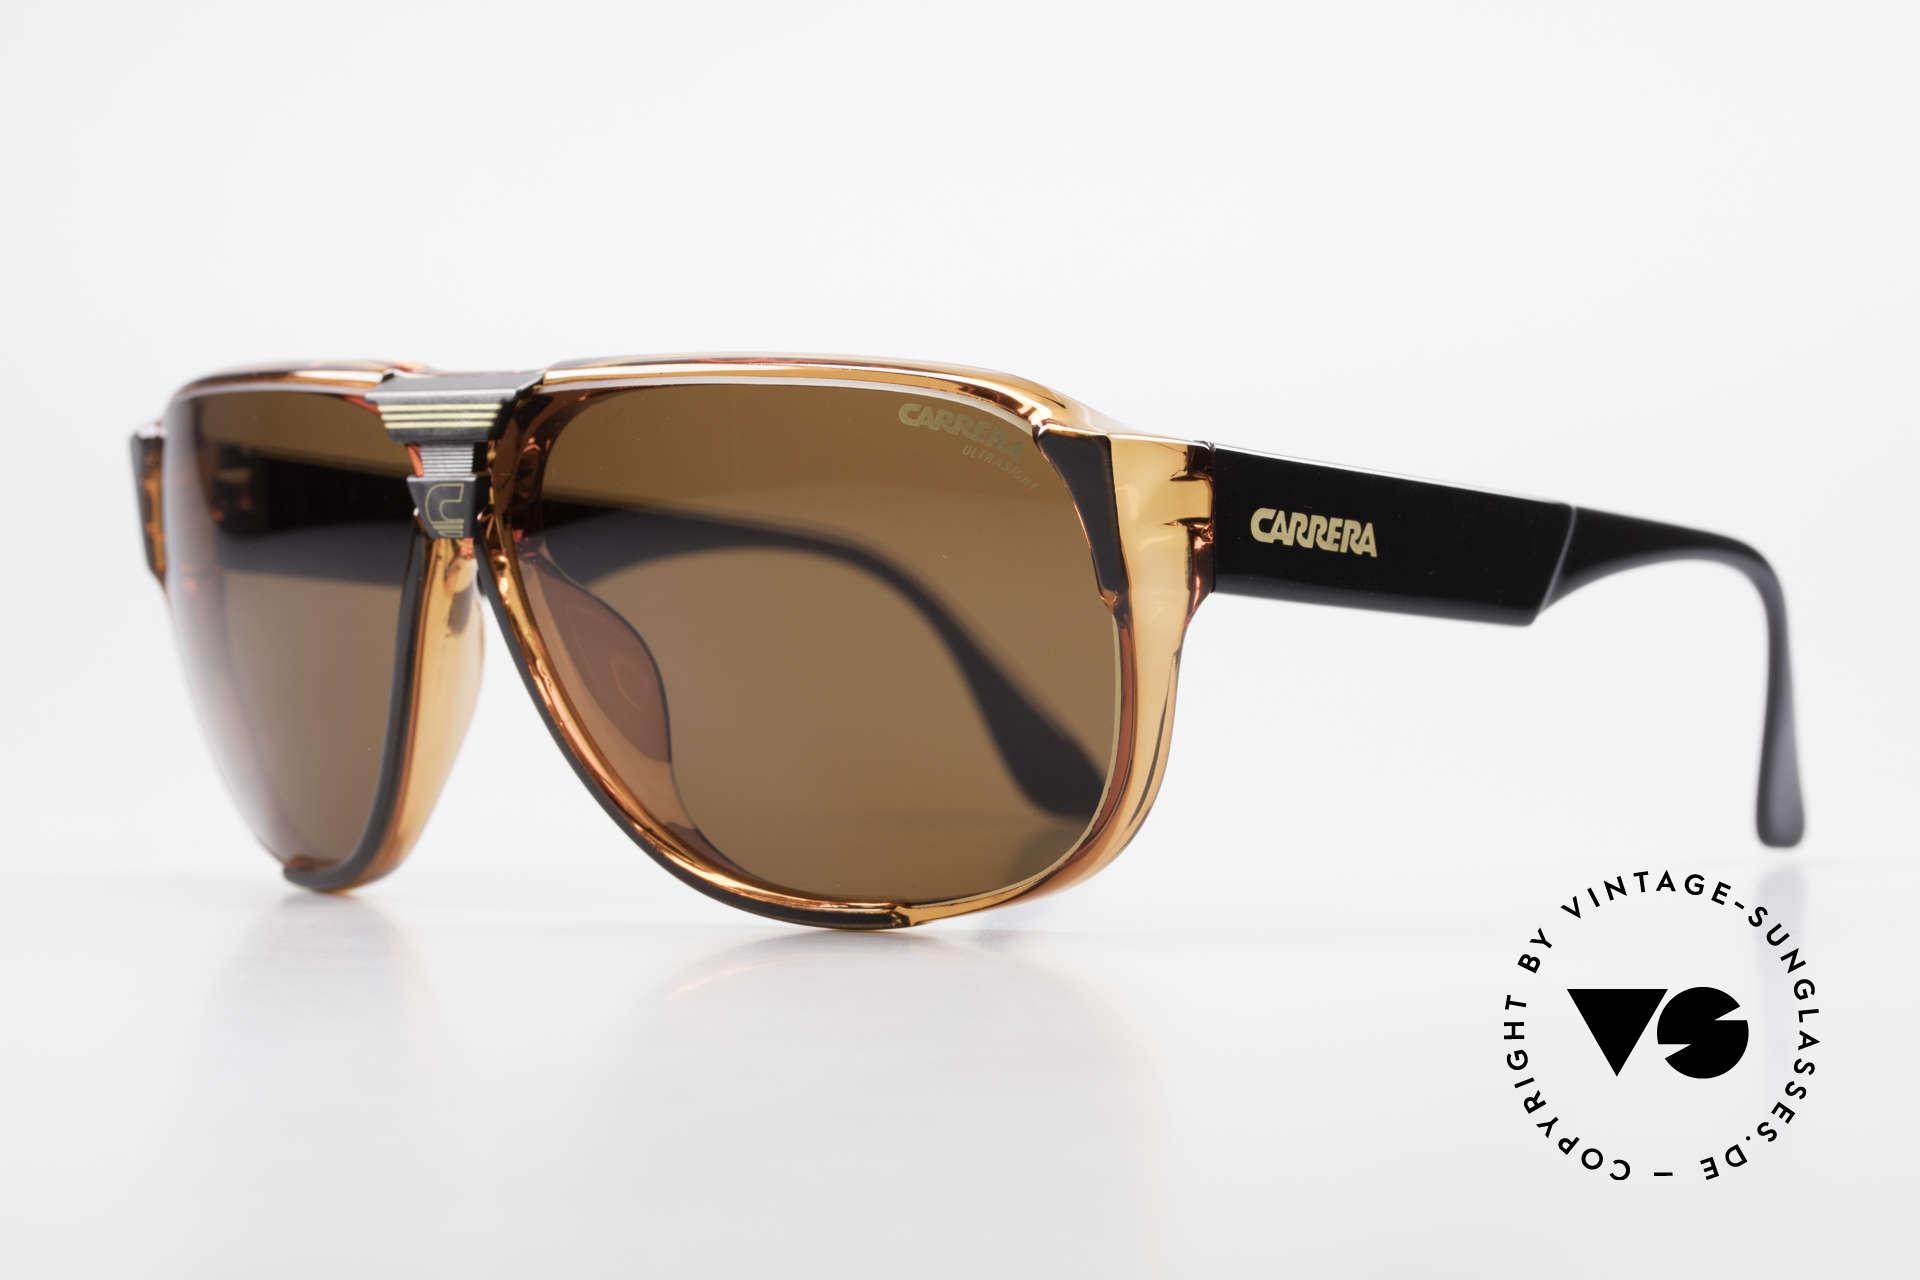 Carrera 5431 Men's 80's Sportsglasses Optyl, state-of-the-art lenses (2 sets) & with orig. case, Made for Men